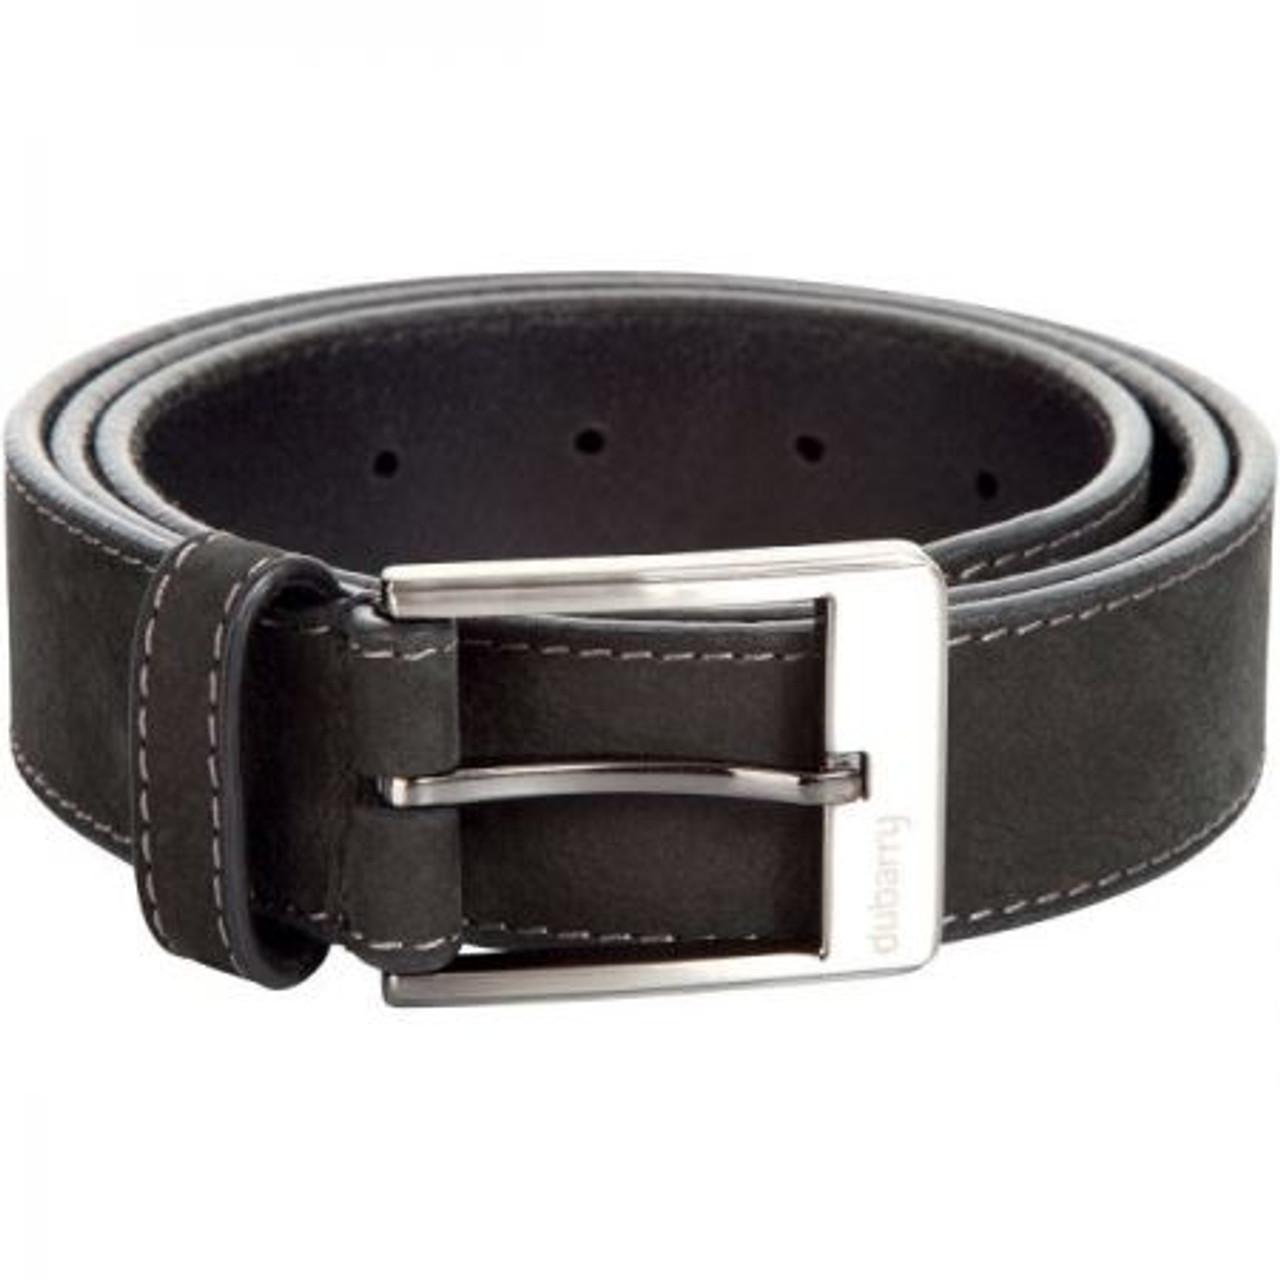 Dubarry Mens Leather Belt in Black